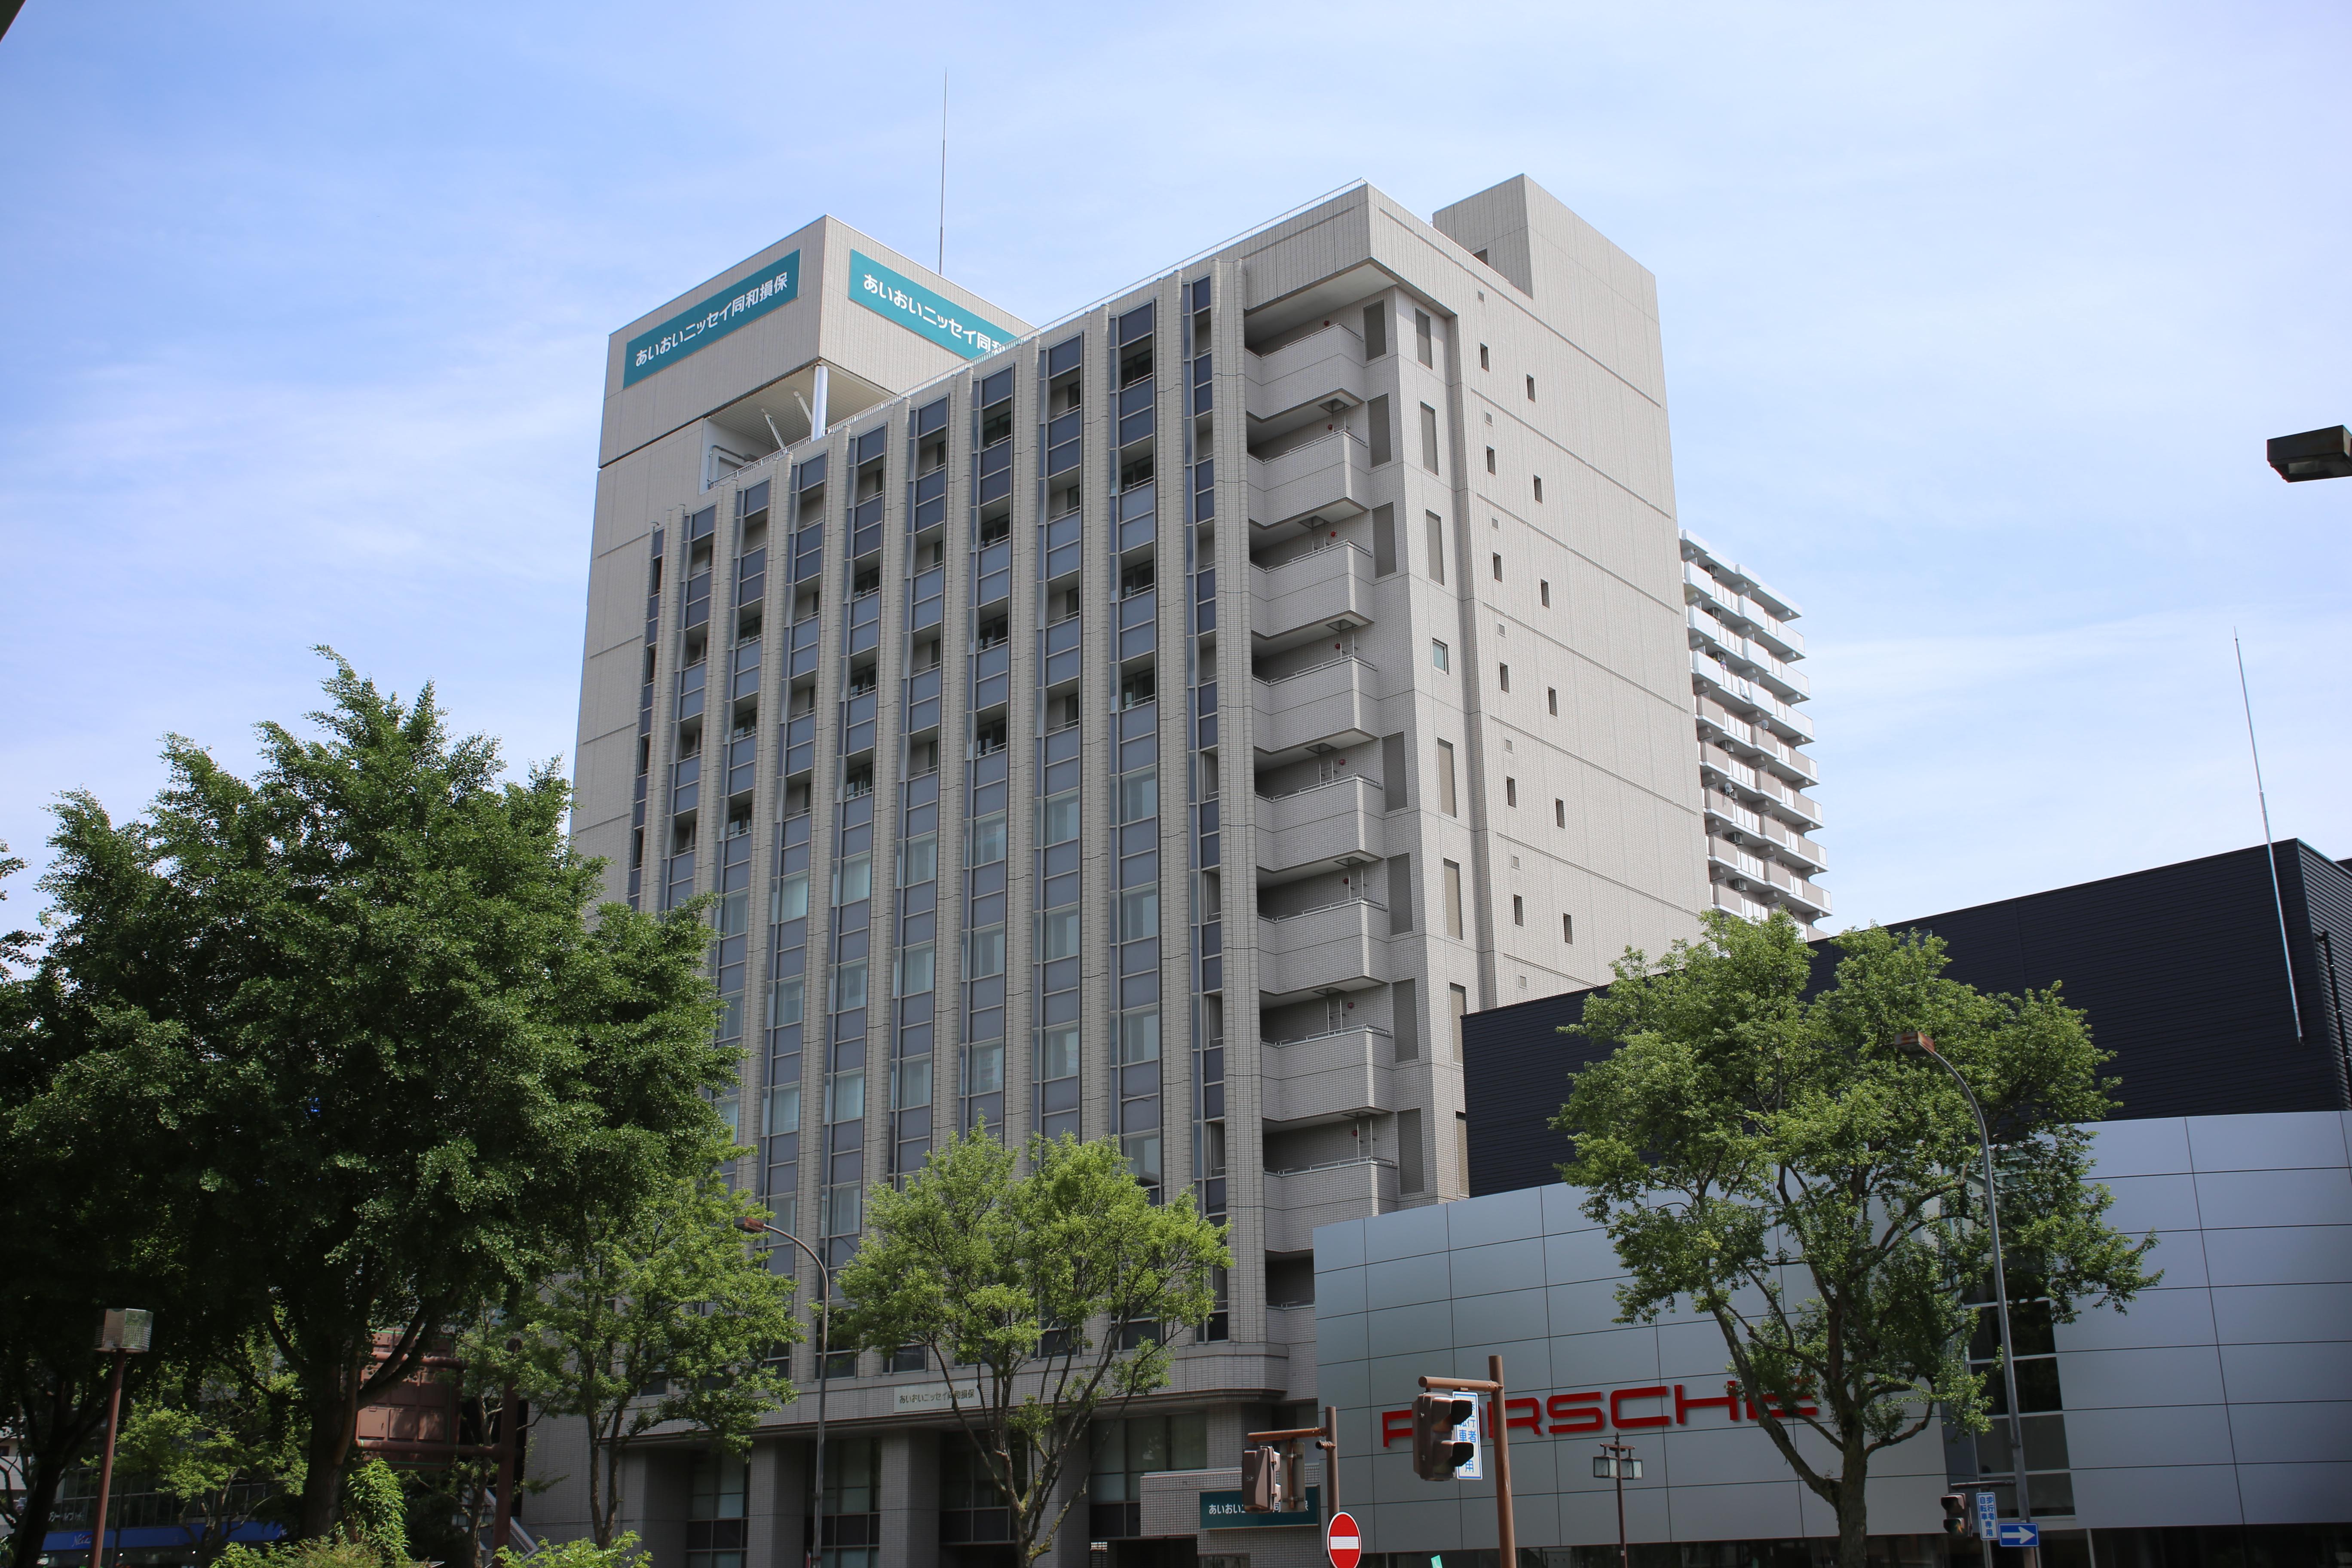 File Aioi Nissay Dowa Insurance Nagoya Tsurumai Building 20150517